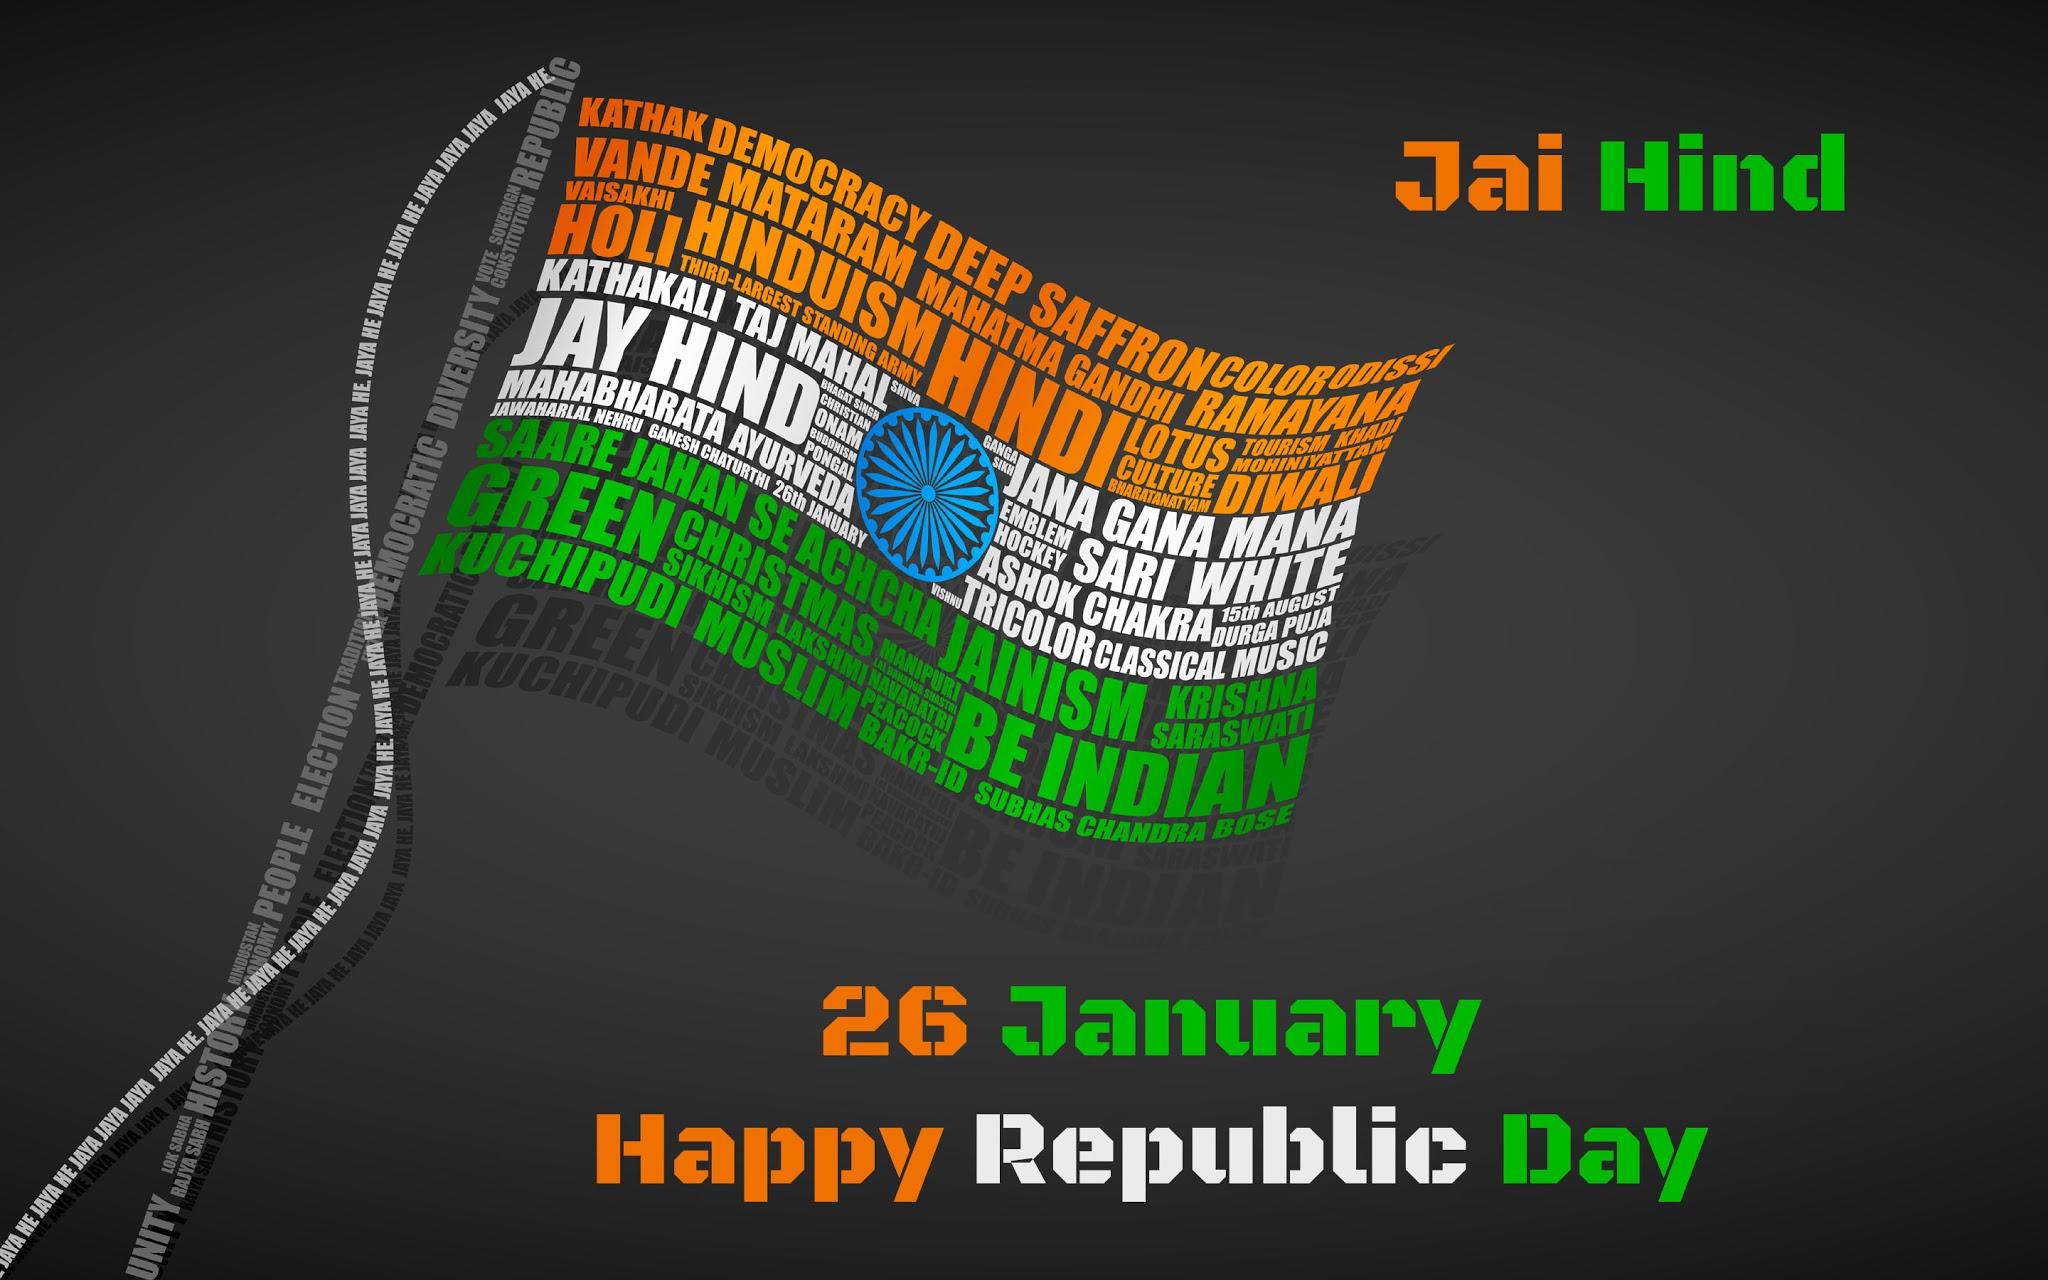 Republic Day Wallpaper Hd 2048x1280 Download Hd Wallpaper Wallpapertip